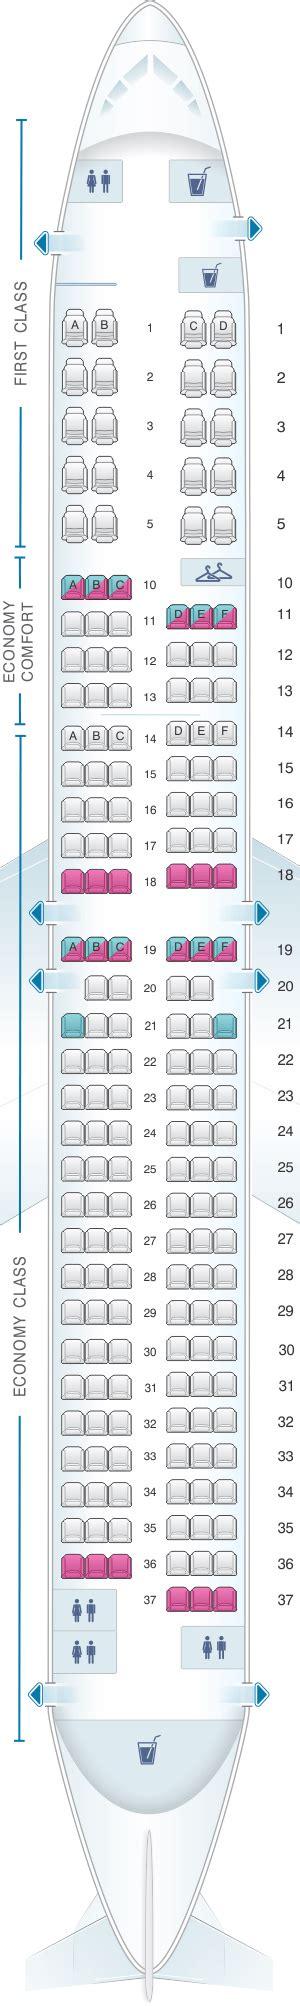 b737 900 config 1 korean air seat maps reviews boeing 737 800 seating delta brokeasshome com